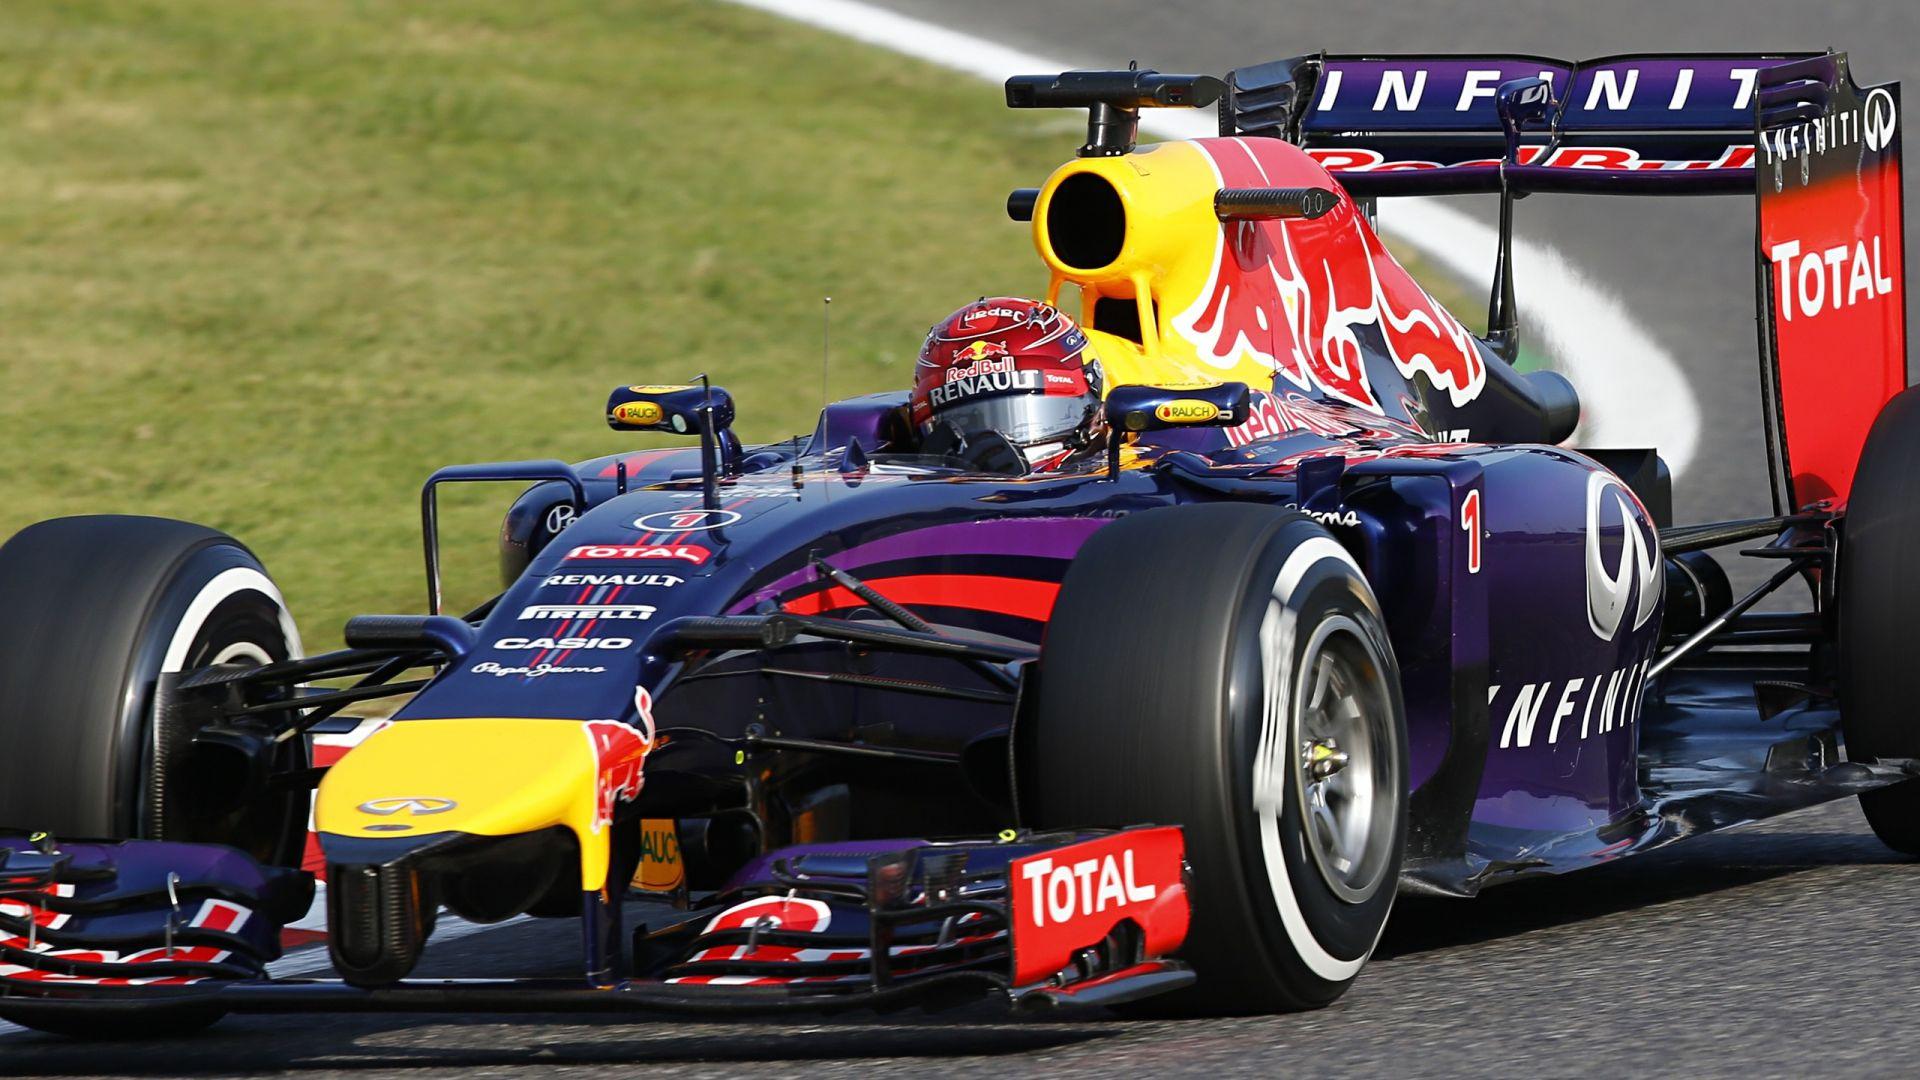 F1/news: F1 GP Austria - Orari TV e TimeTable - MotorBox